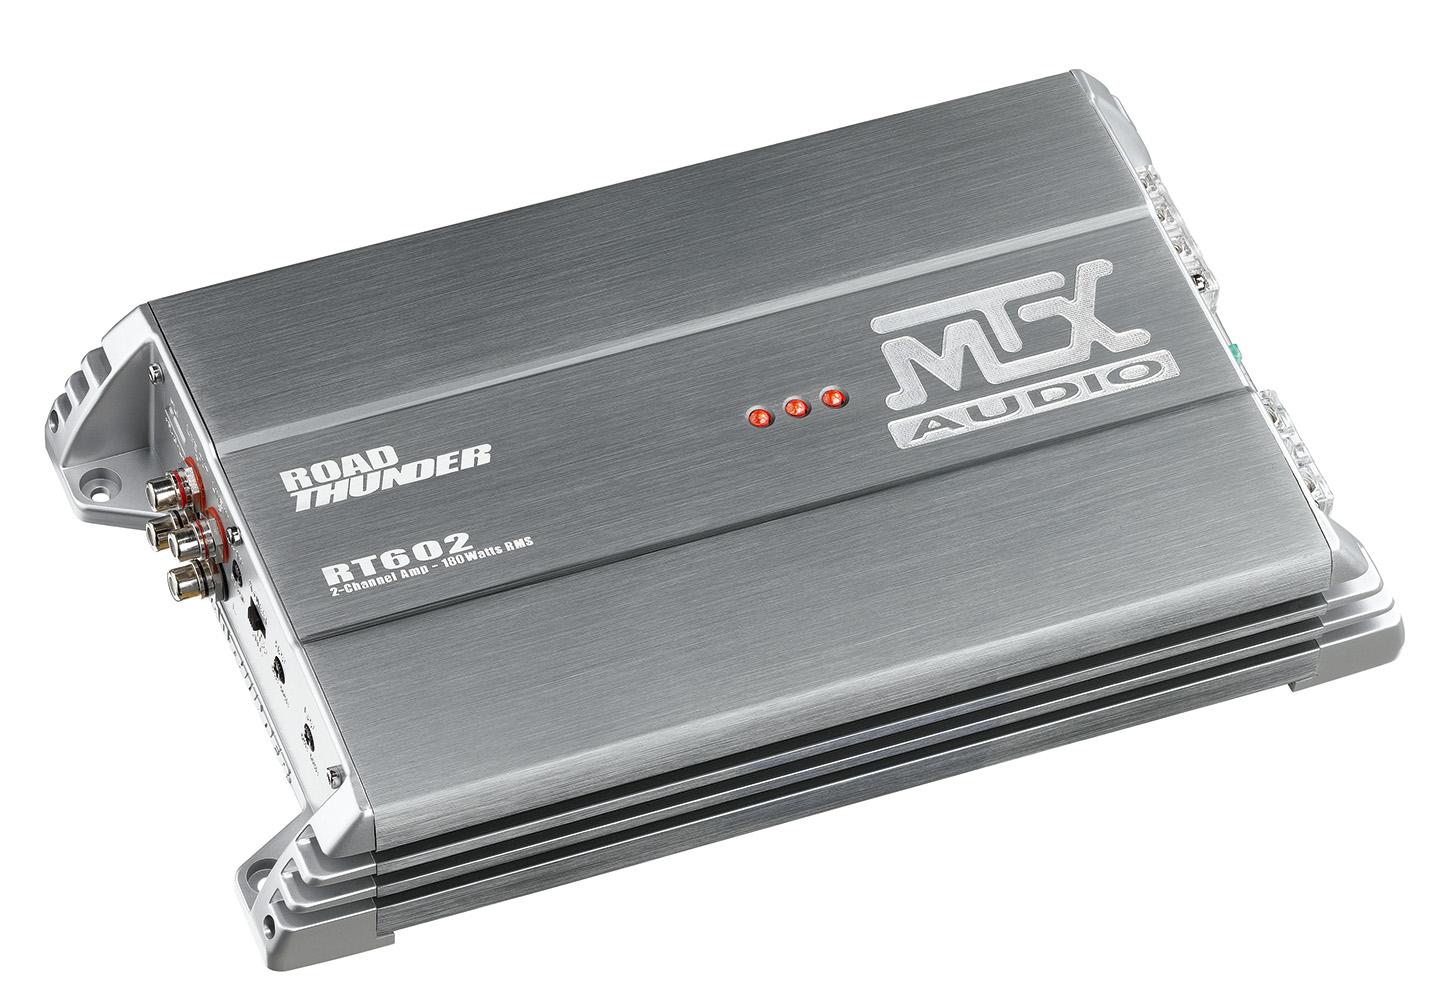 Rt602 Mtx Roadthunder 180w Car Amplifier Mtx Audio